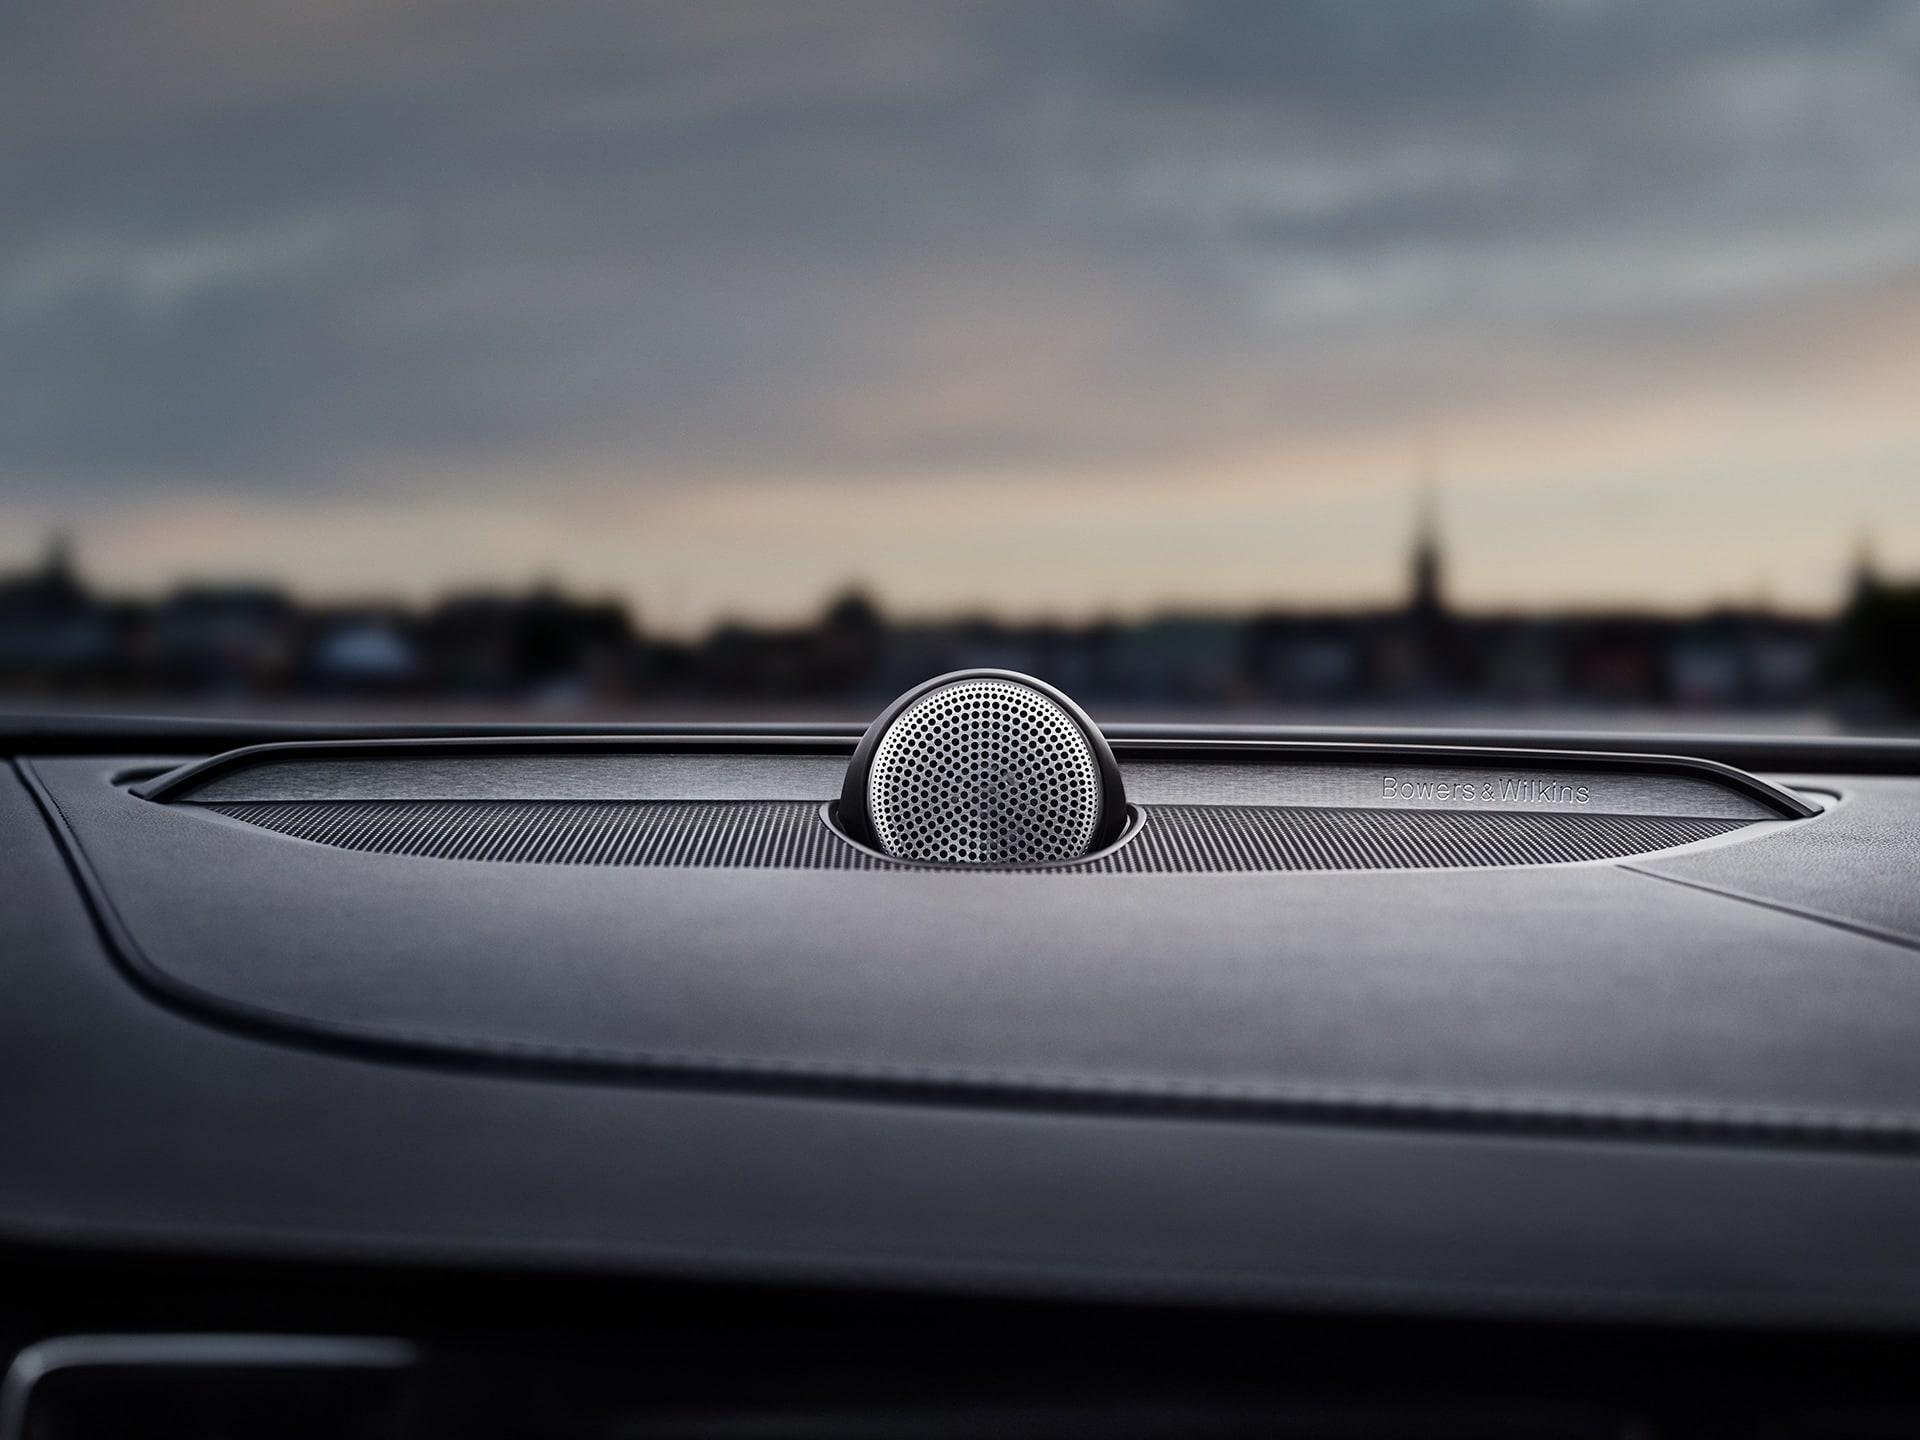 Динамики Bowers & Wilkins в Volvo XC90.